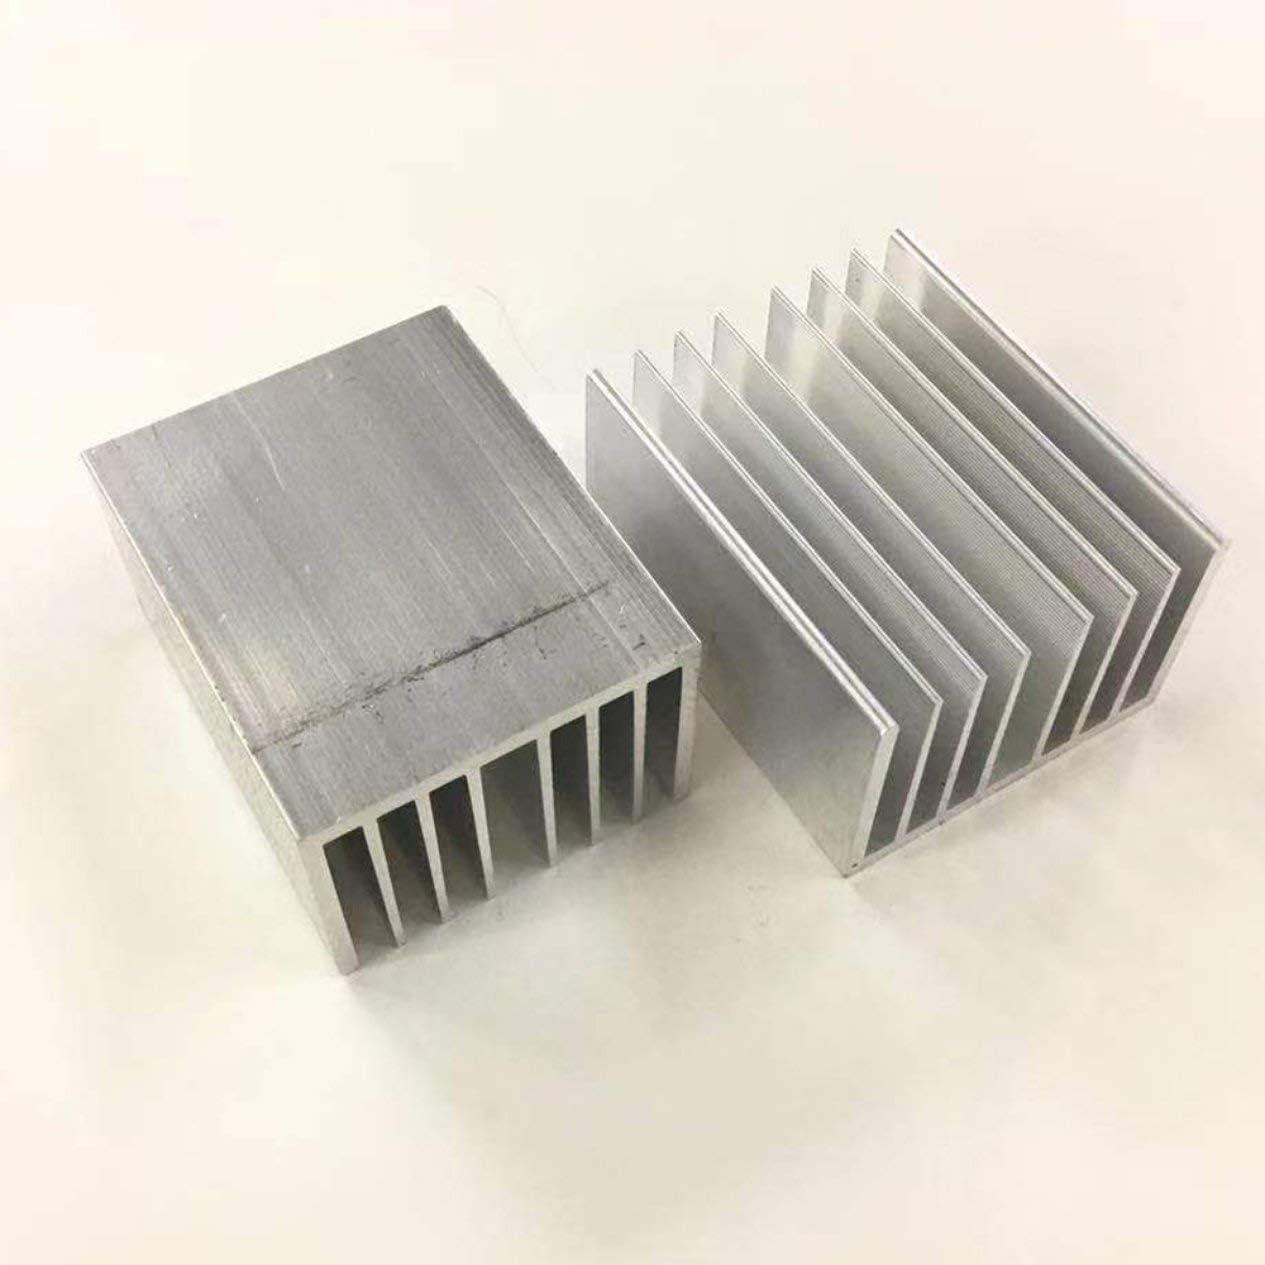 1pcs Aluminum heatsink LED heatsink 8055-100mm Heat Sink Aluminum Profiles Aluminum Color Chassis Radiator